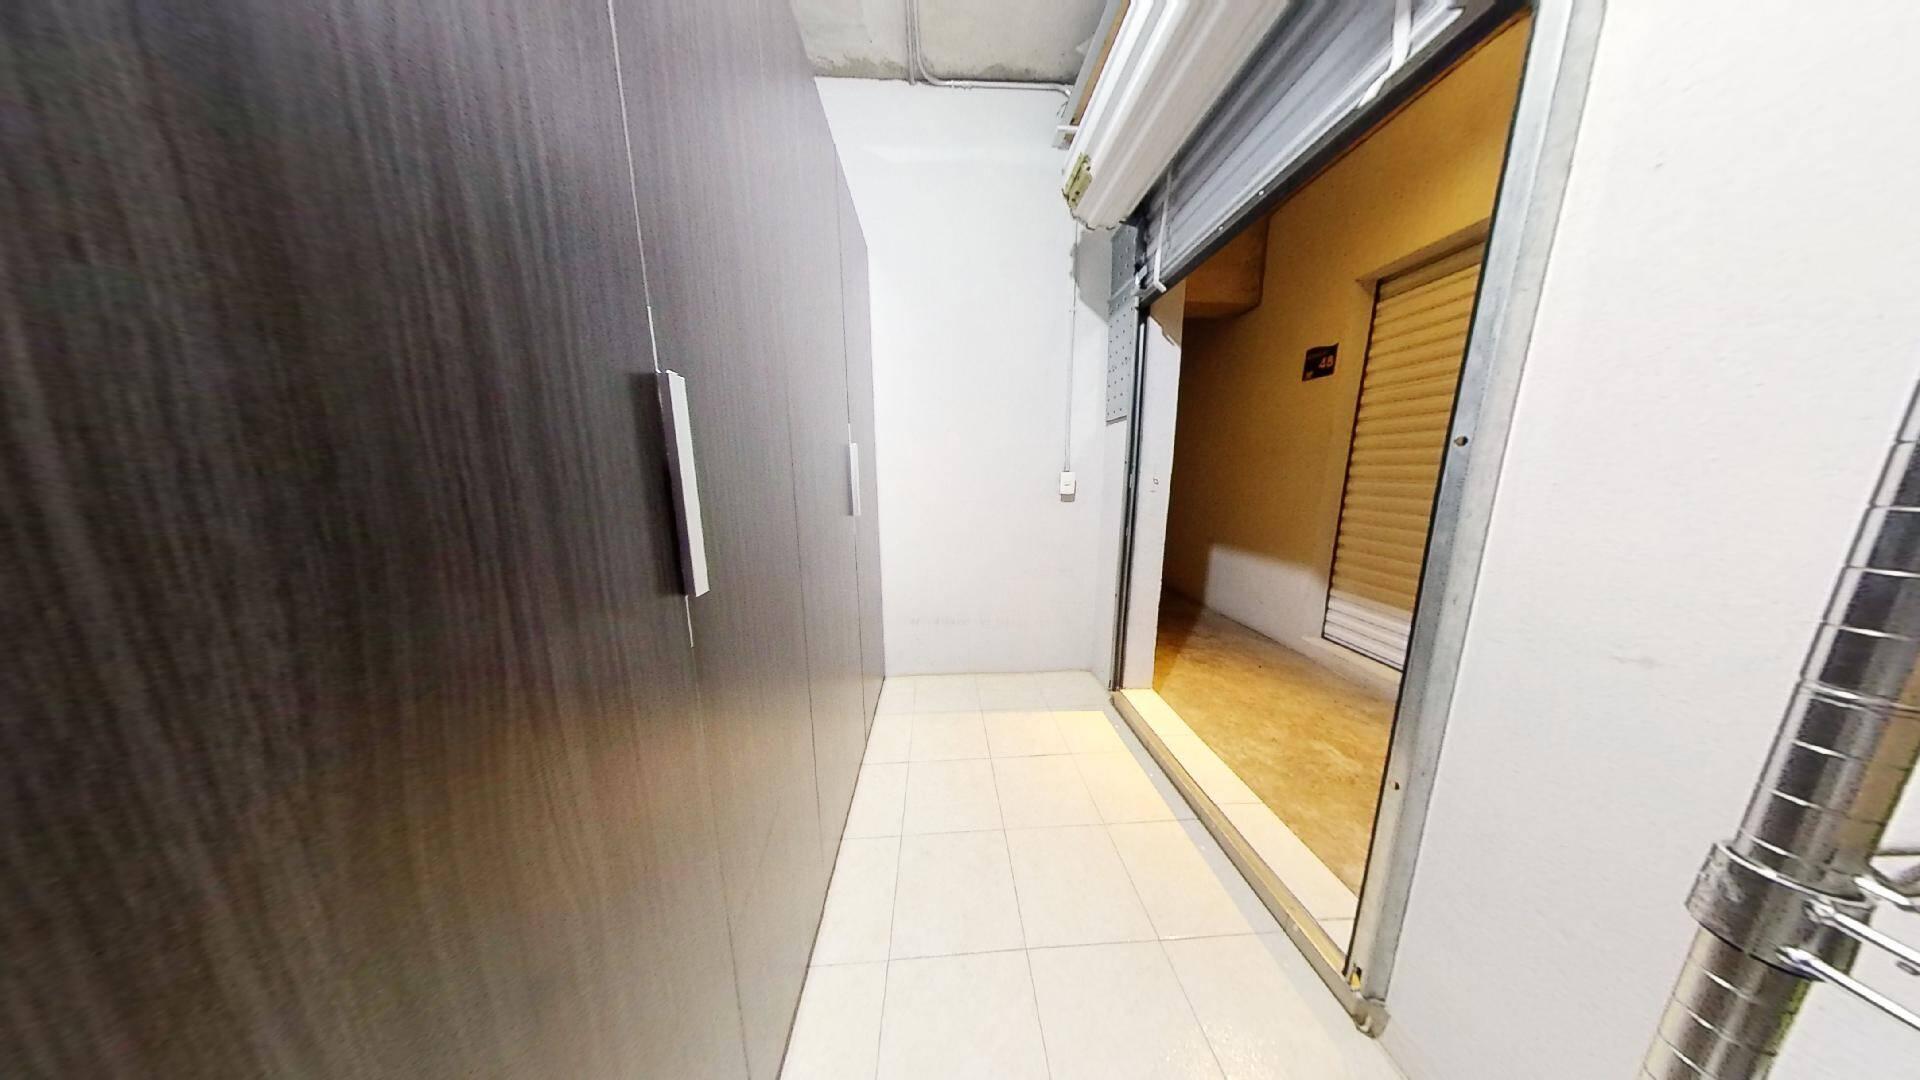 Venta departamento 2 recámaras en Marina Park. Bodega de 6 m2.